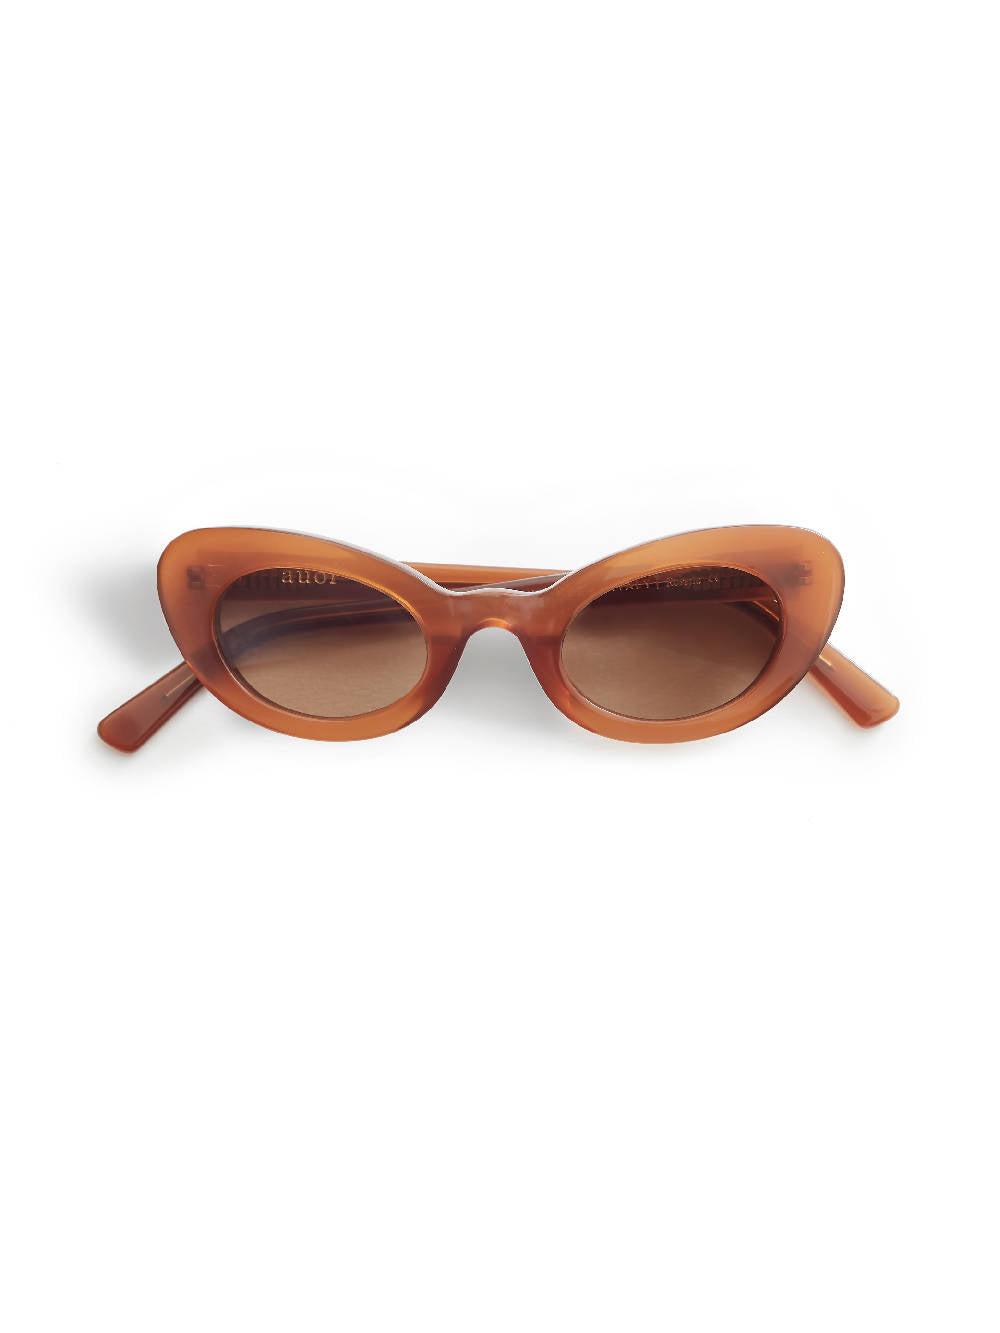 Auor Sunglasses Rosetta Walnut Brown